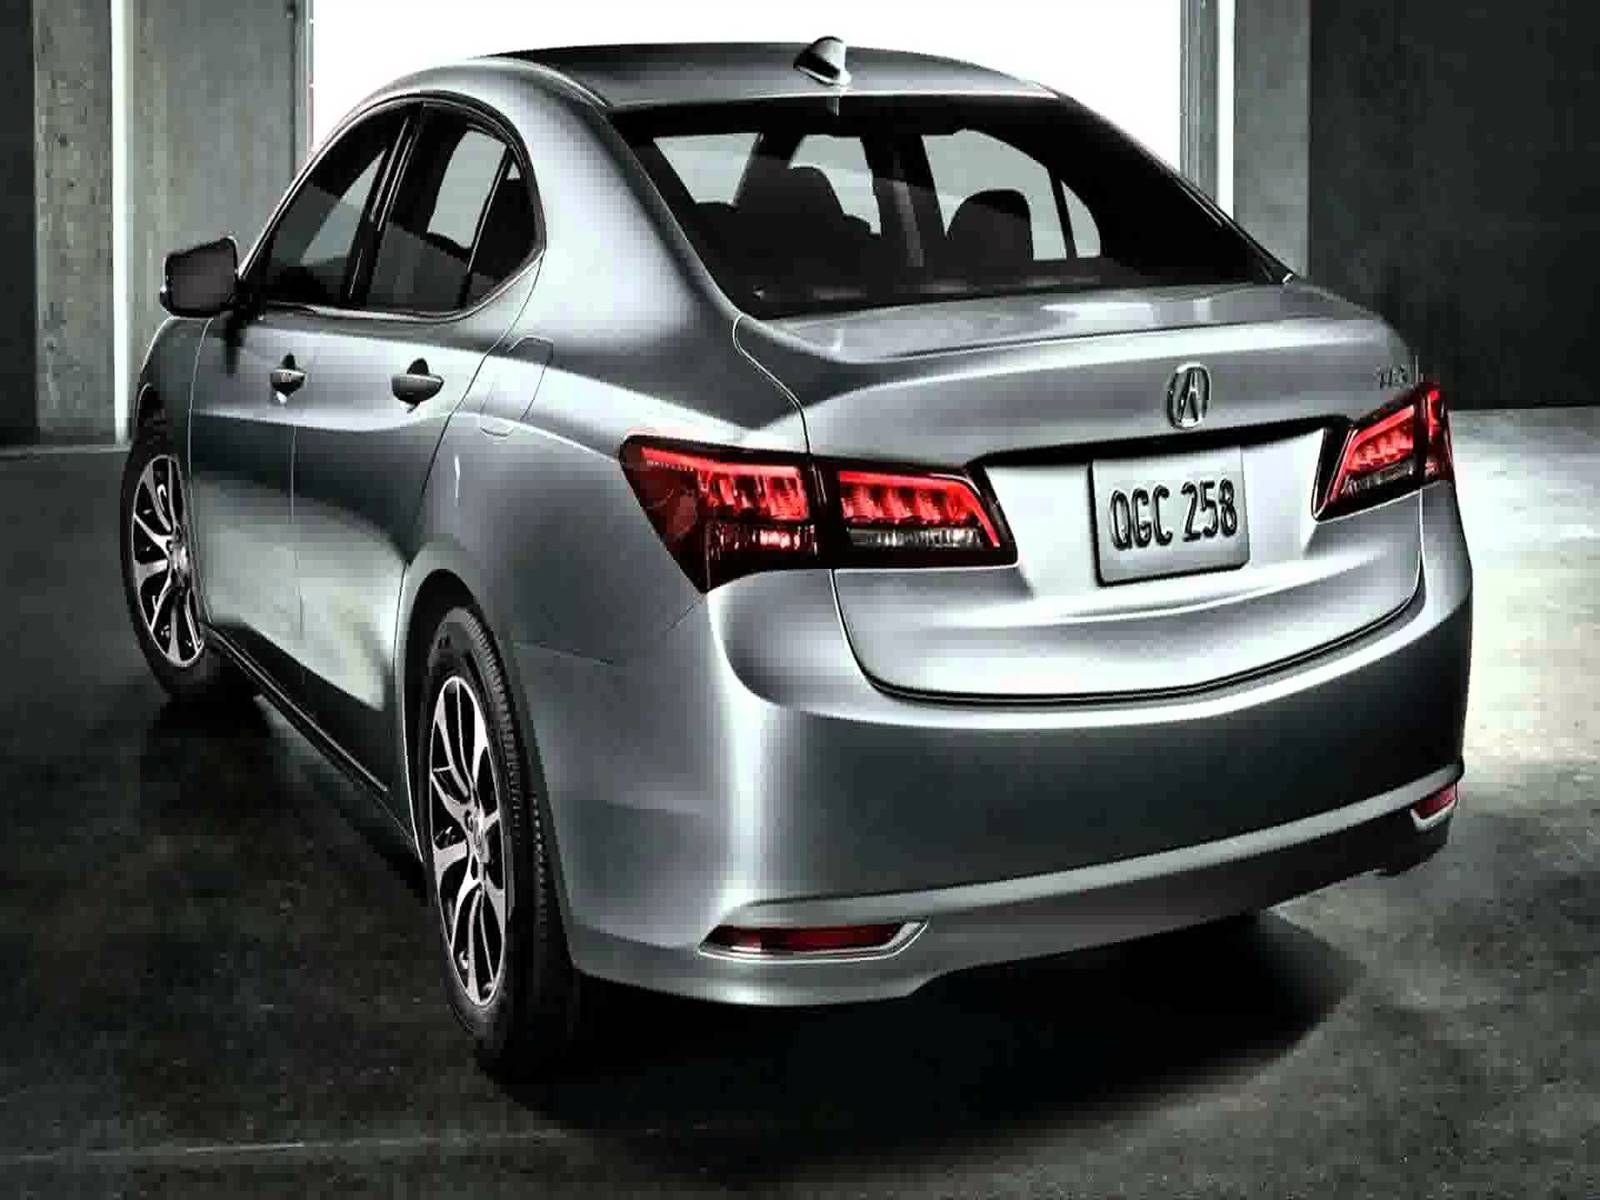 New 2015 Honda Accord Sport Price Check more at https